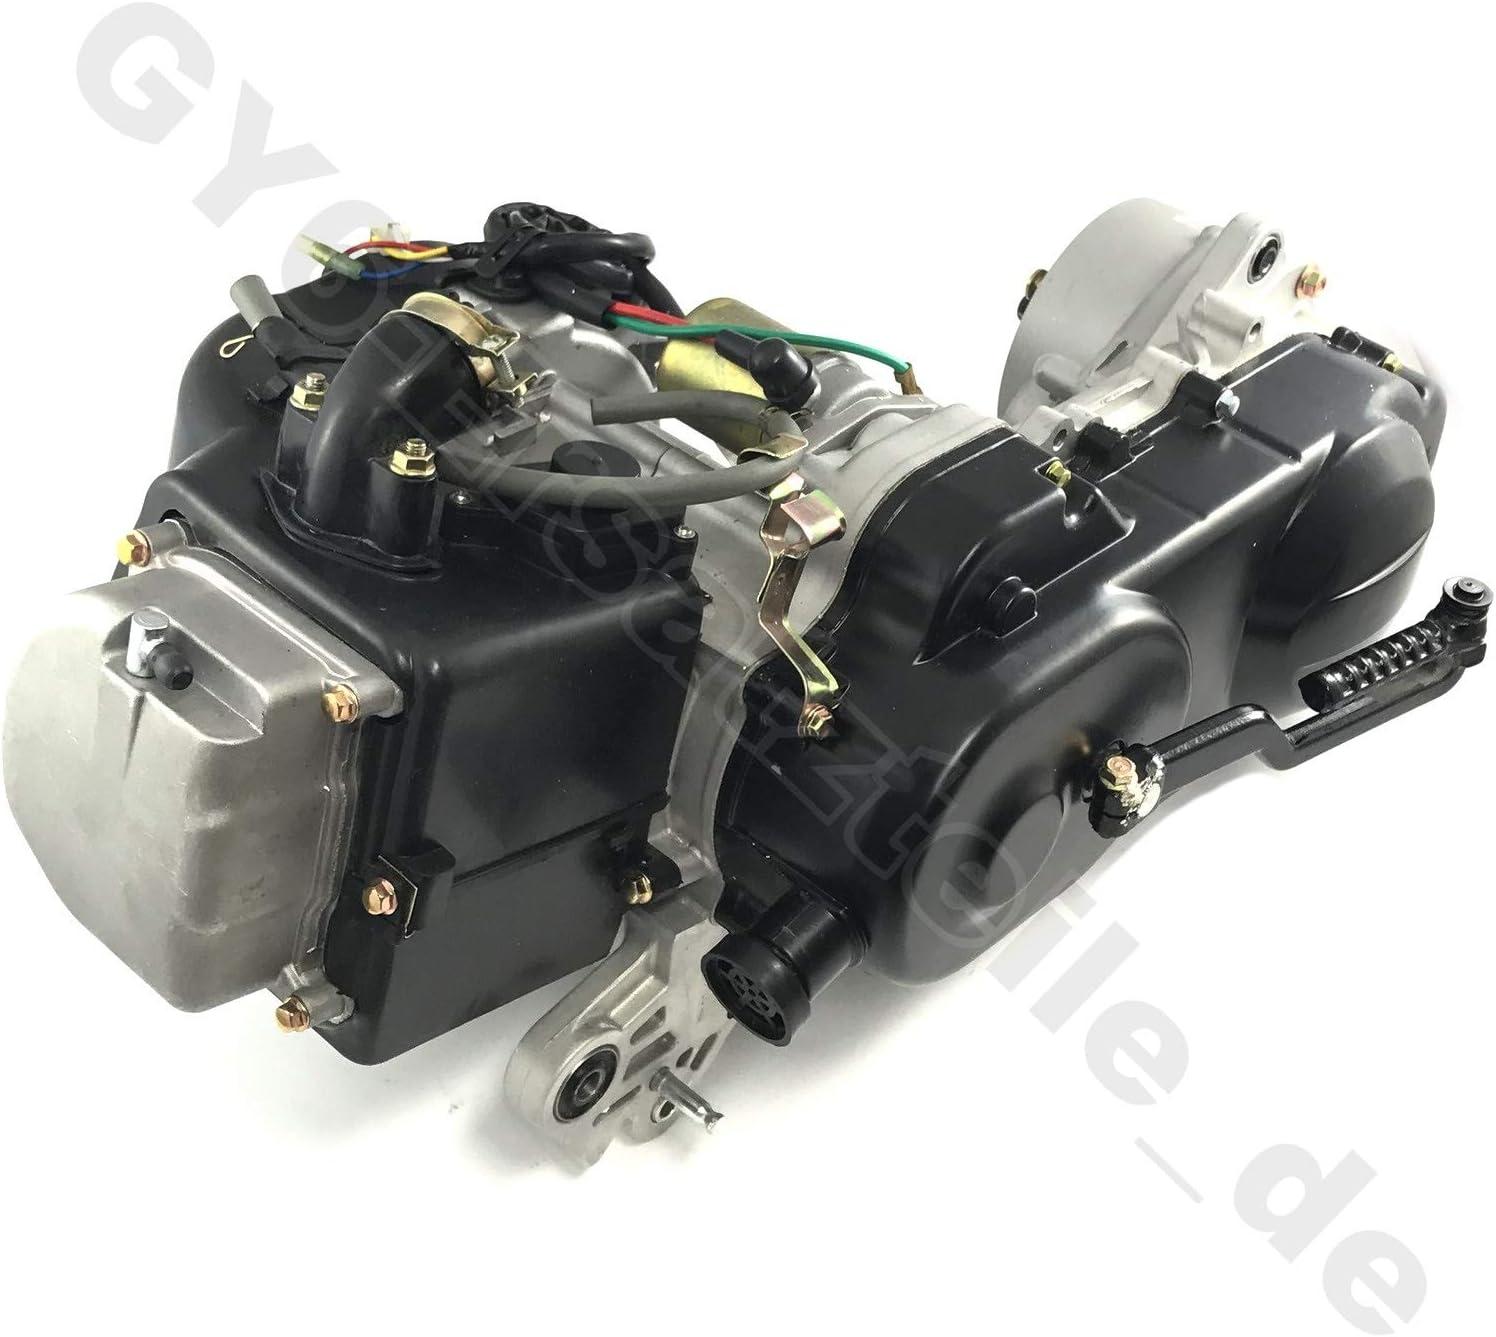 Komplett 4 Takt Motor 10 40cm 139qma 139qmb 50ccm China Roller Baotian Benzhou Yiying Rex Hyosung Znen Gy6 China Roller 49ccm Auto